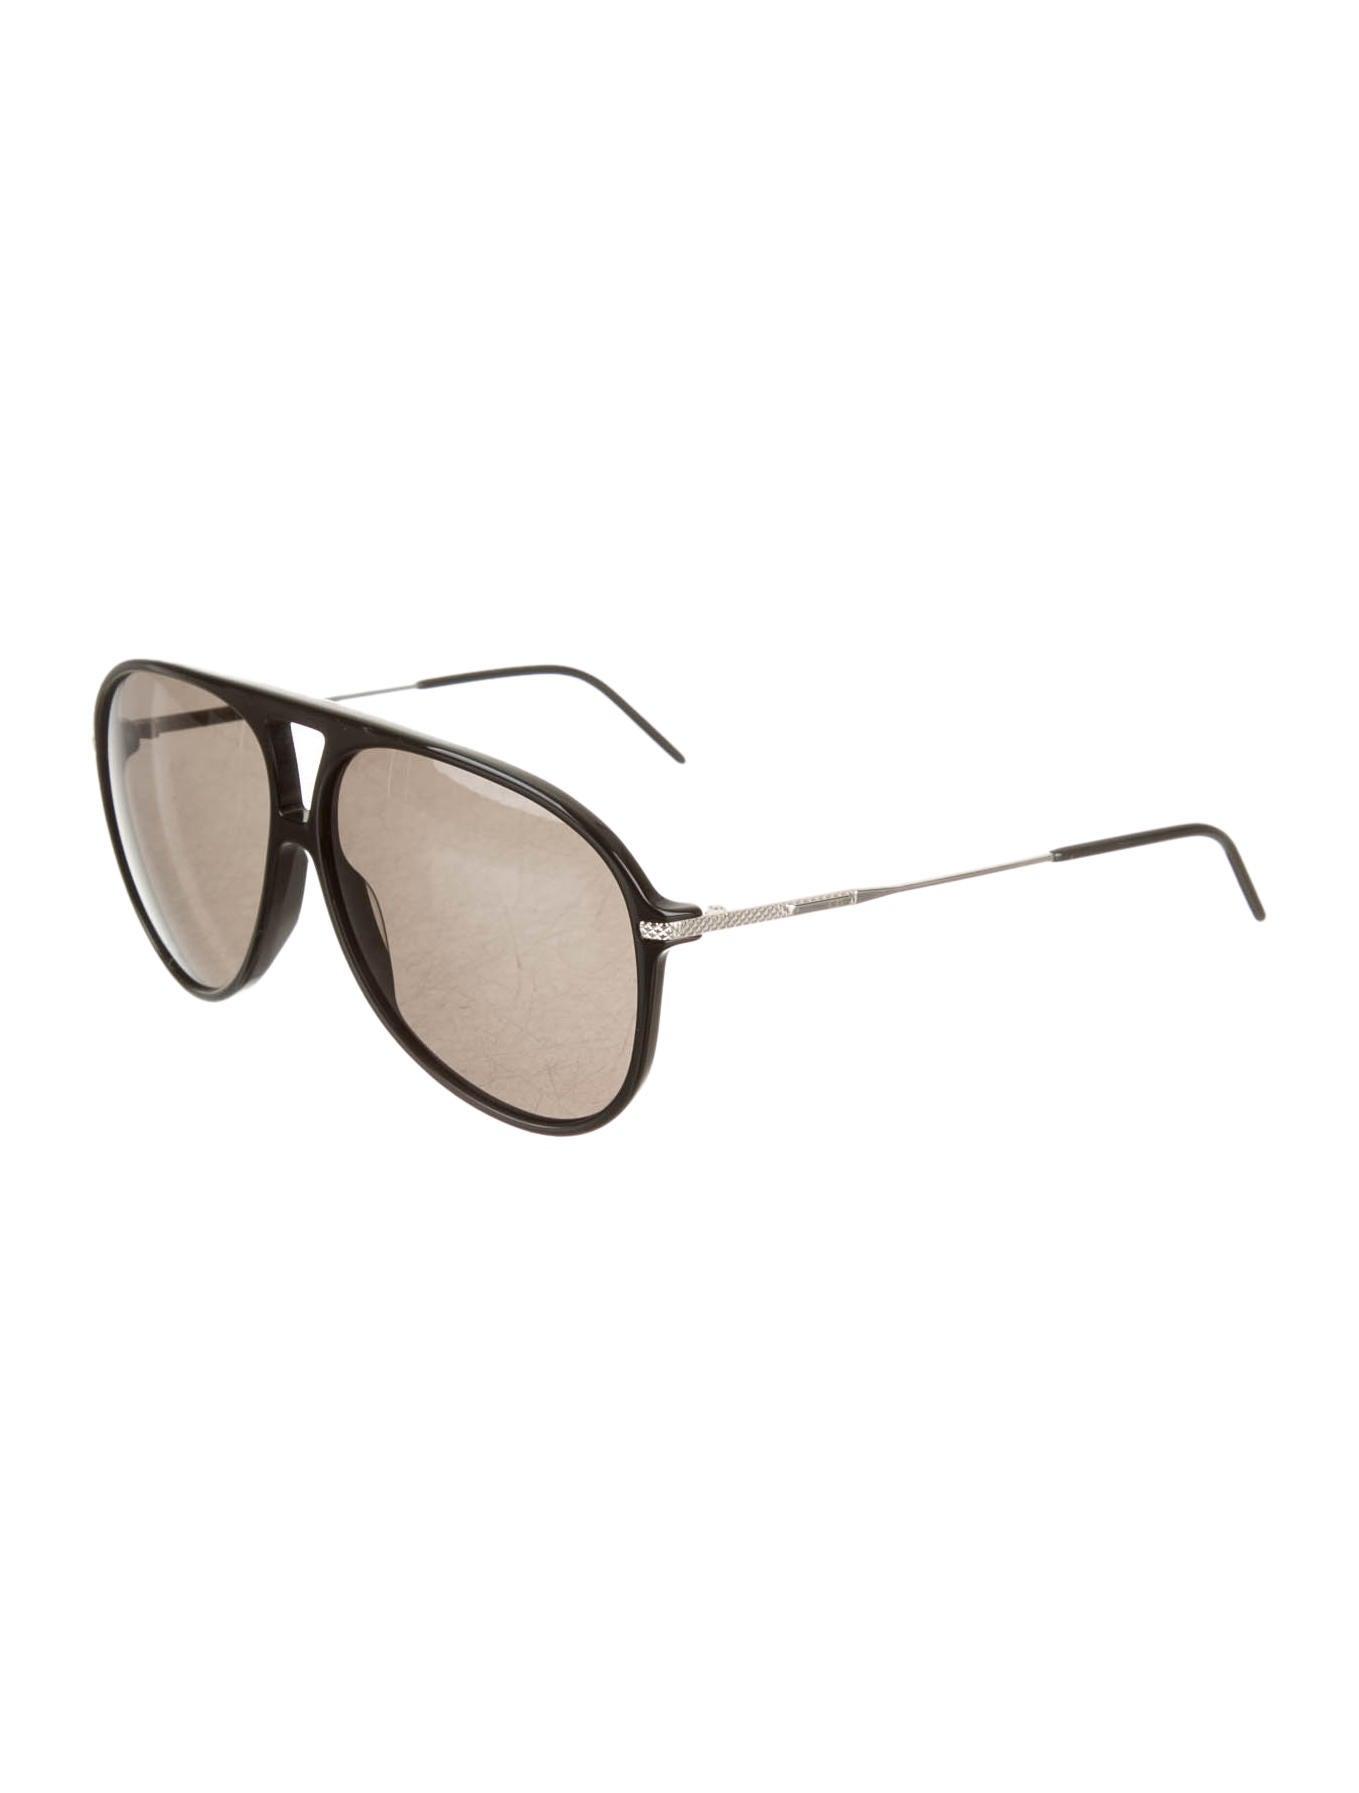 f88380fb11b9 Dior Homme Sunglasses 2016